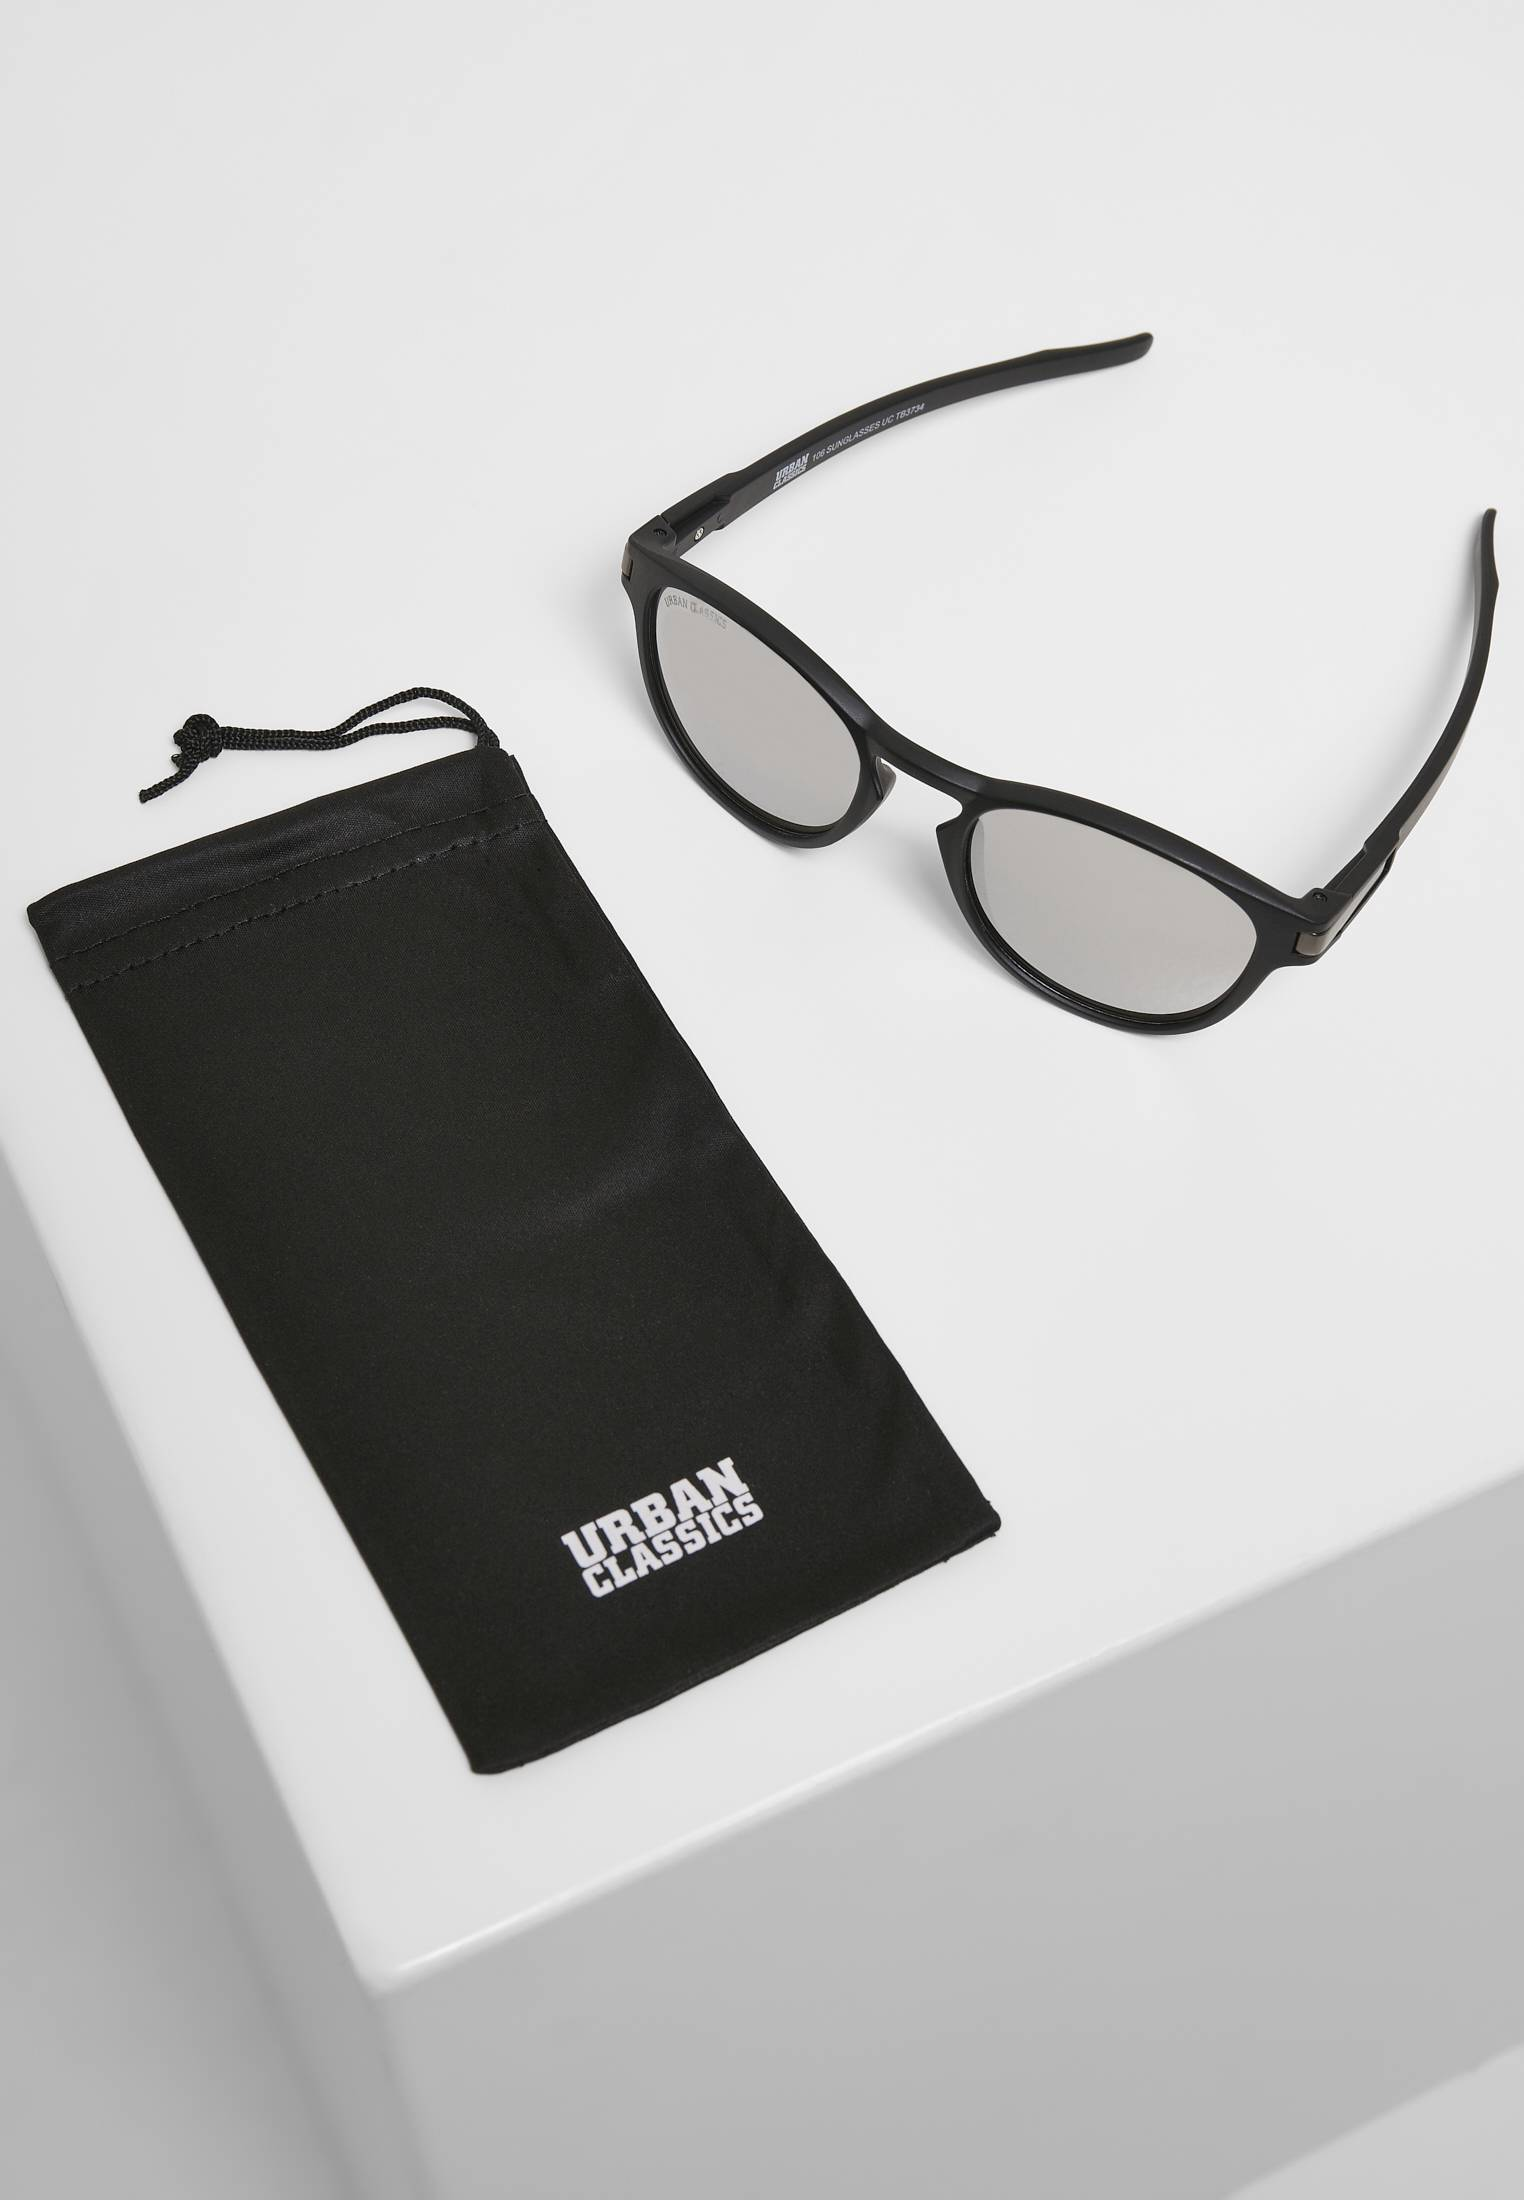 Urban Classics 106 Sunglasses UC black/silver - One Size